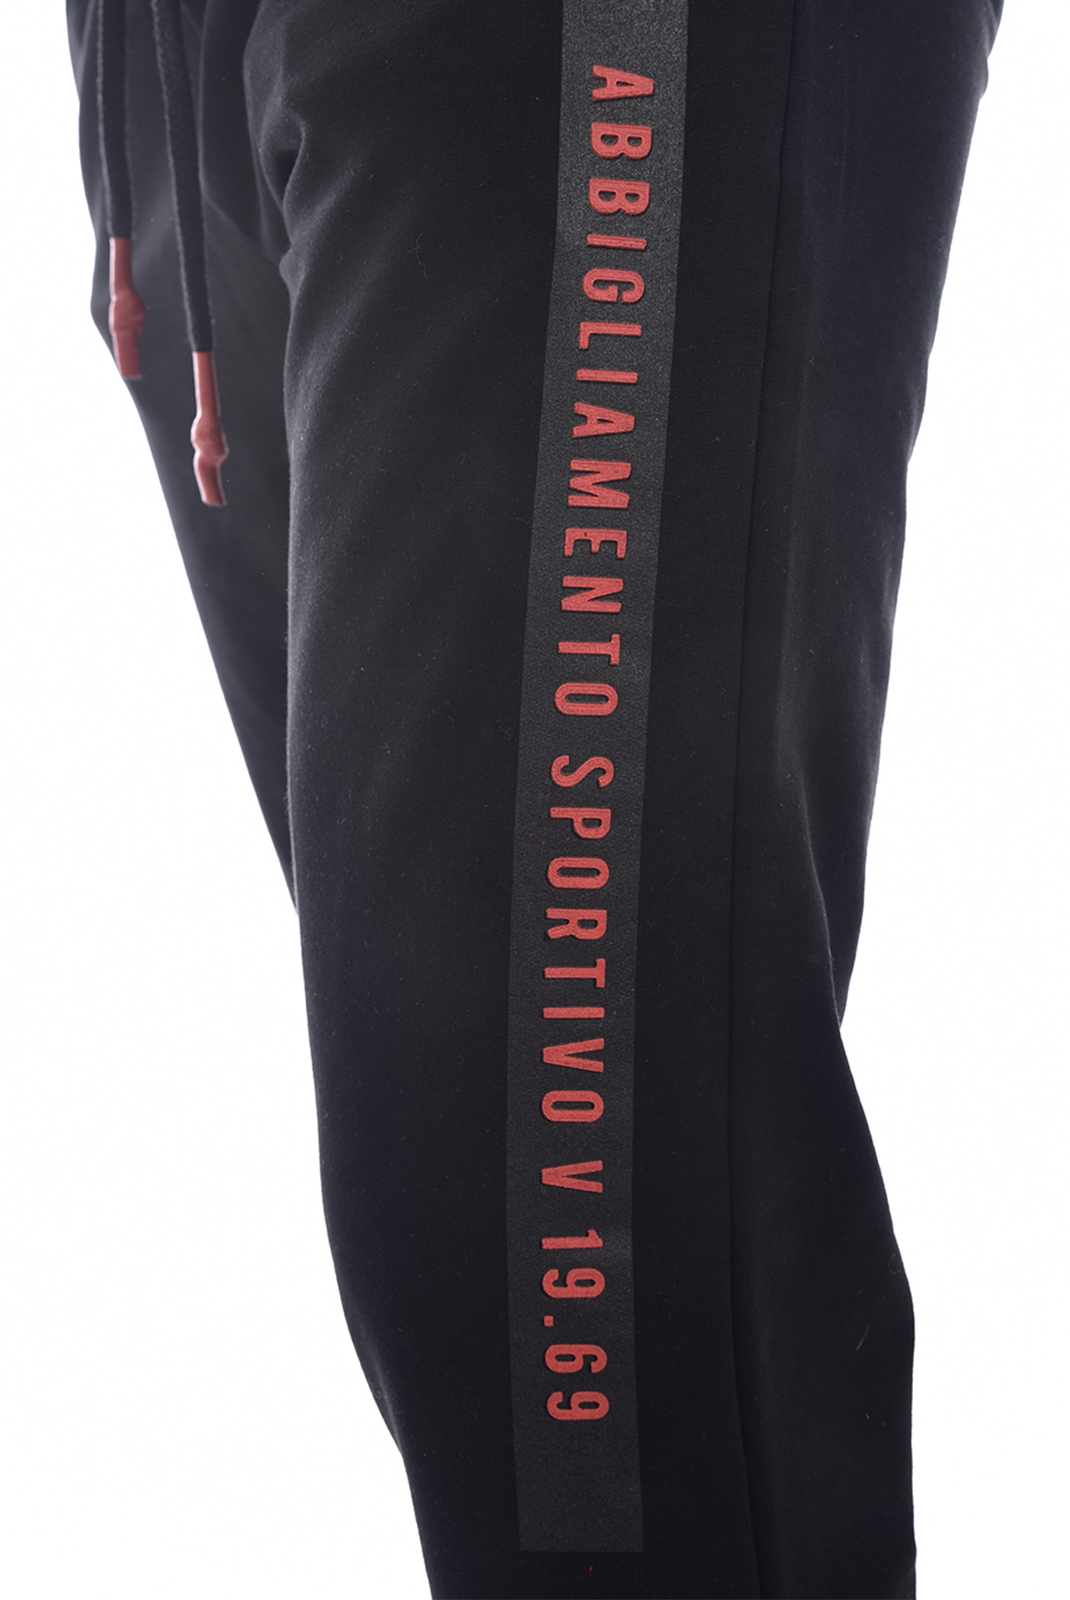 Pantalons sport/streetwear  V1969 by Versace 1969 orosei jog NOIR